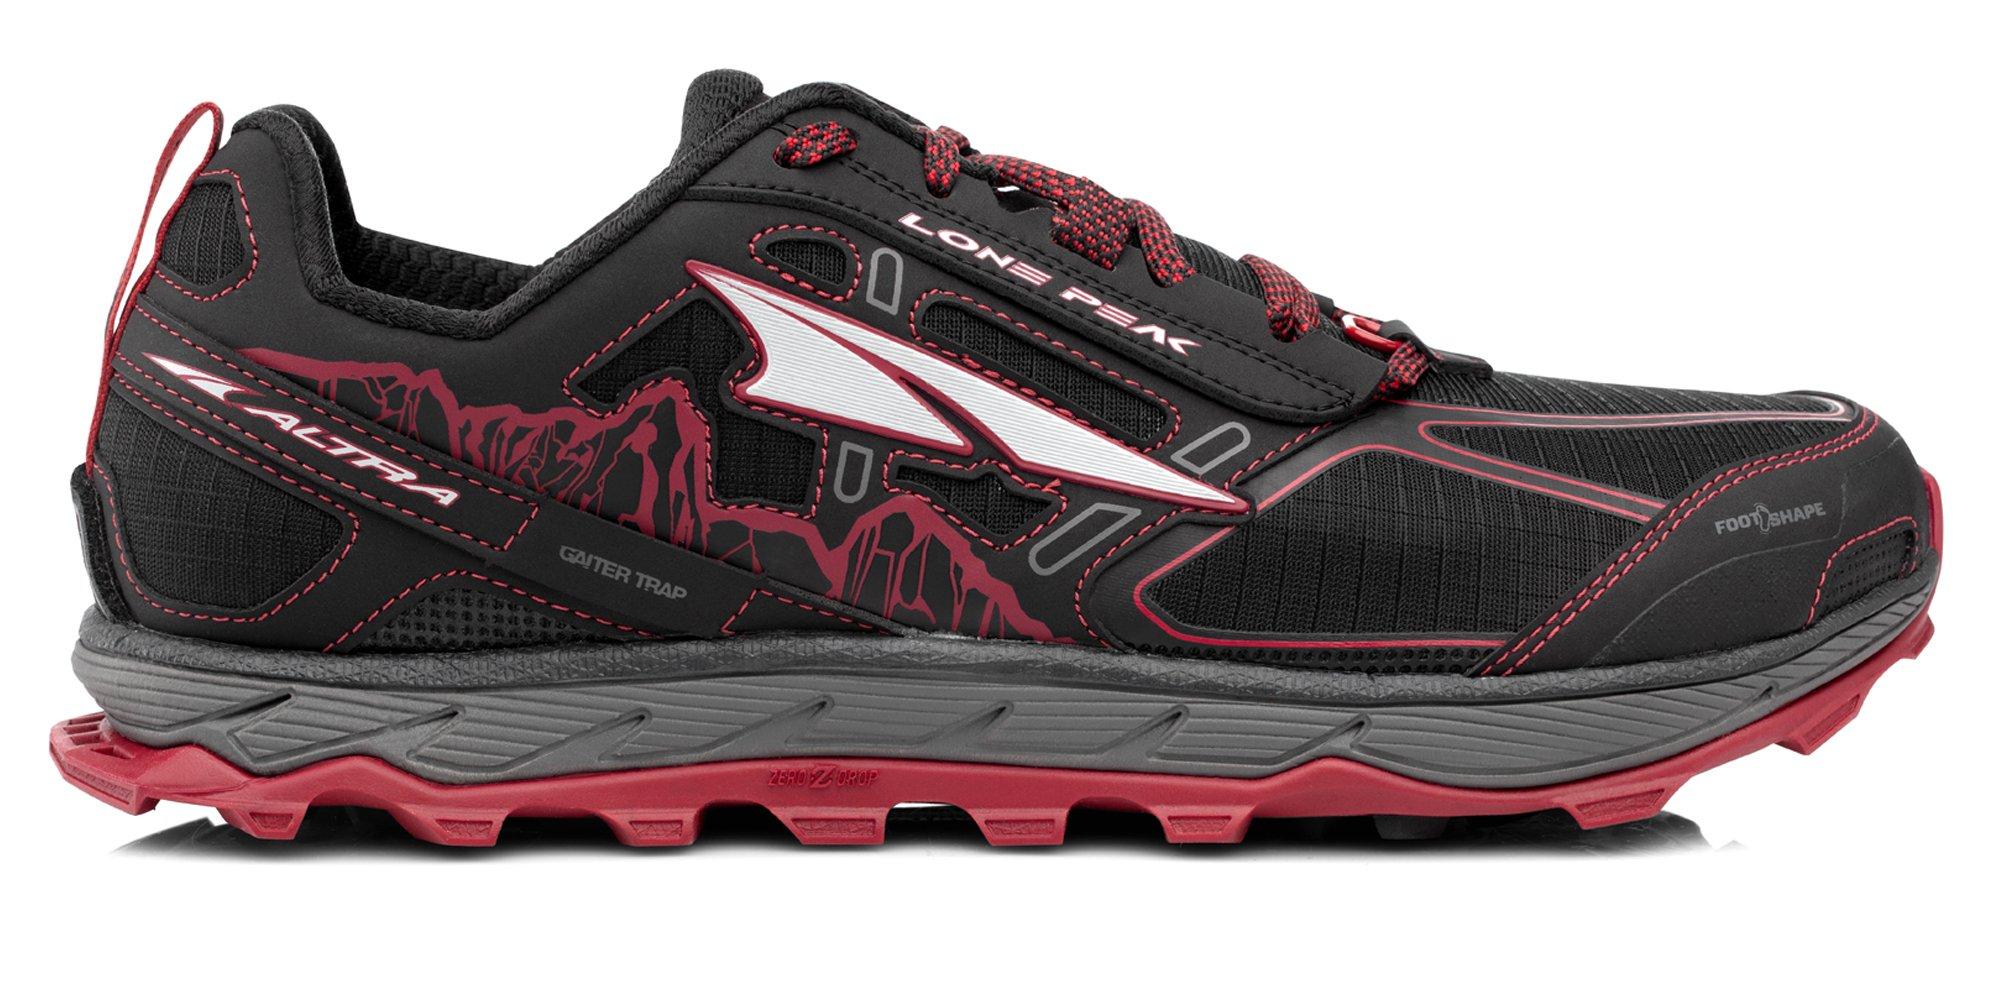 Altra AFM1855F Men's Lone Peak 4.0 Trail Running Shoe, Black/Red - 7 D(M) US